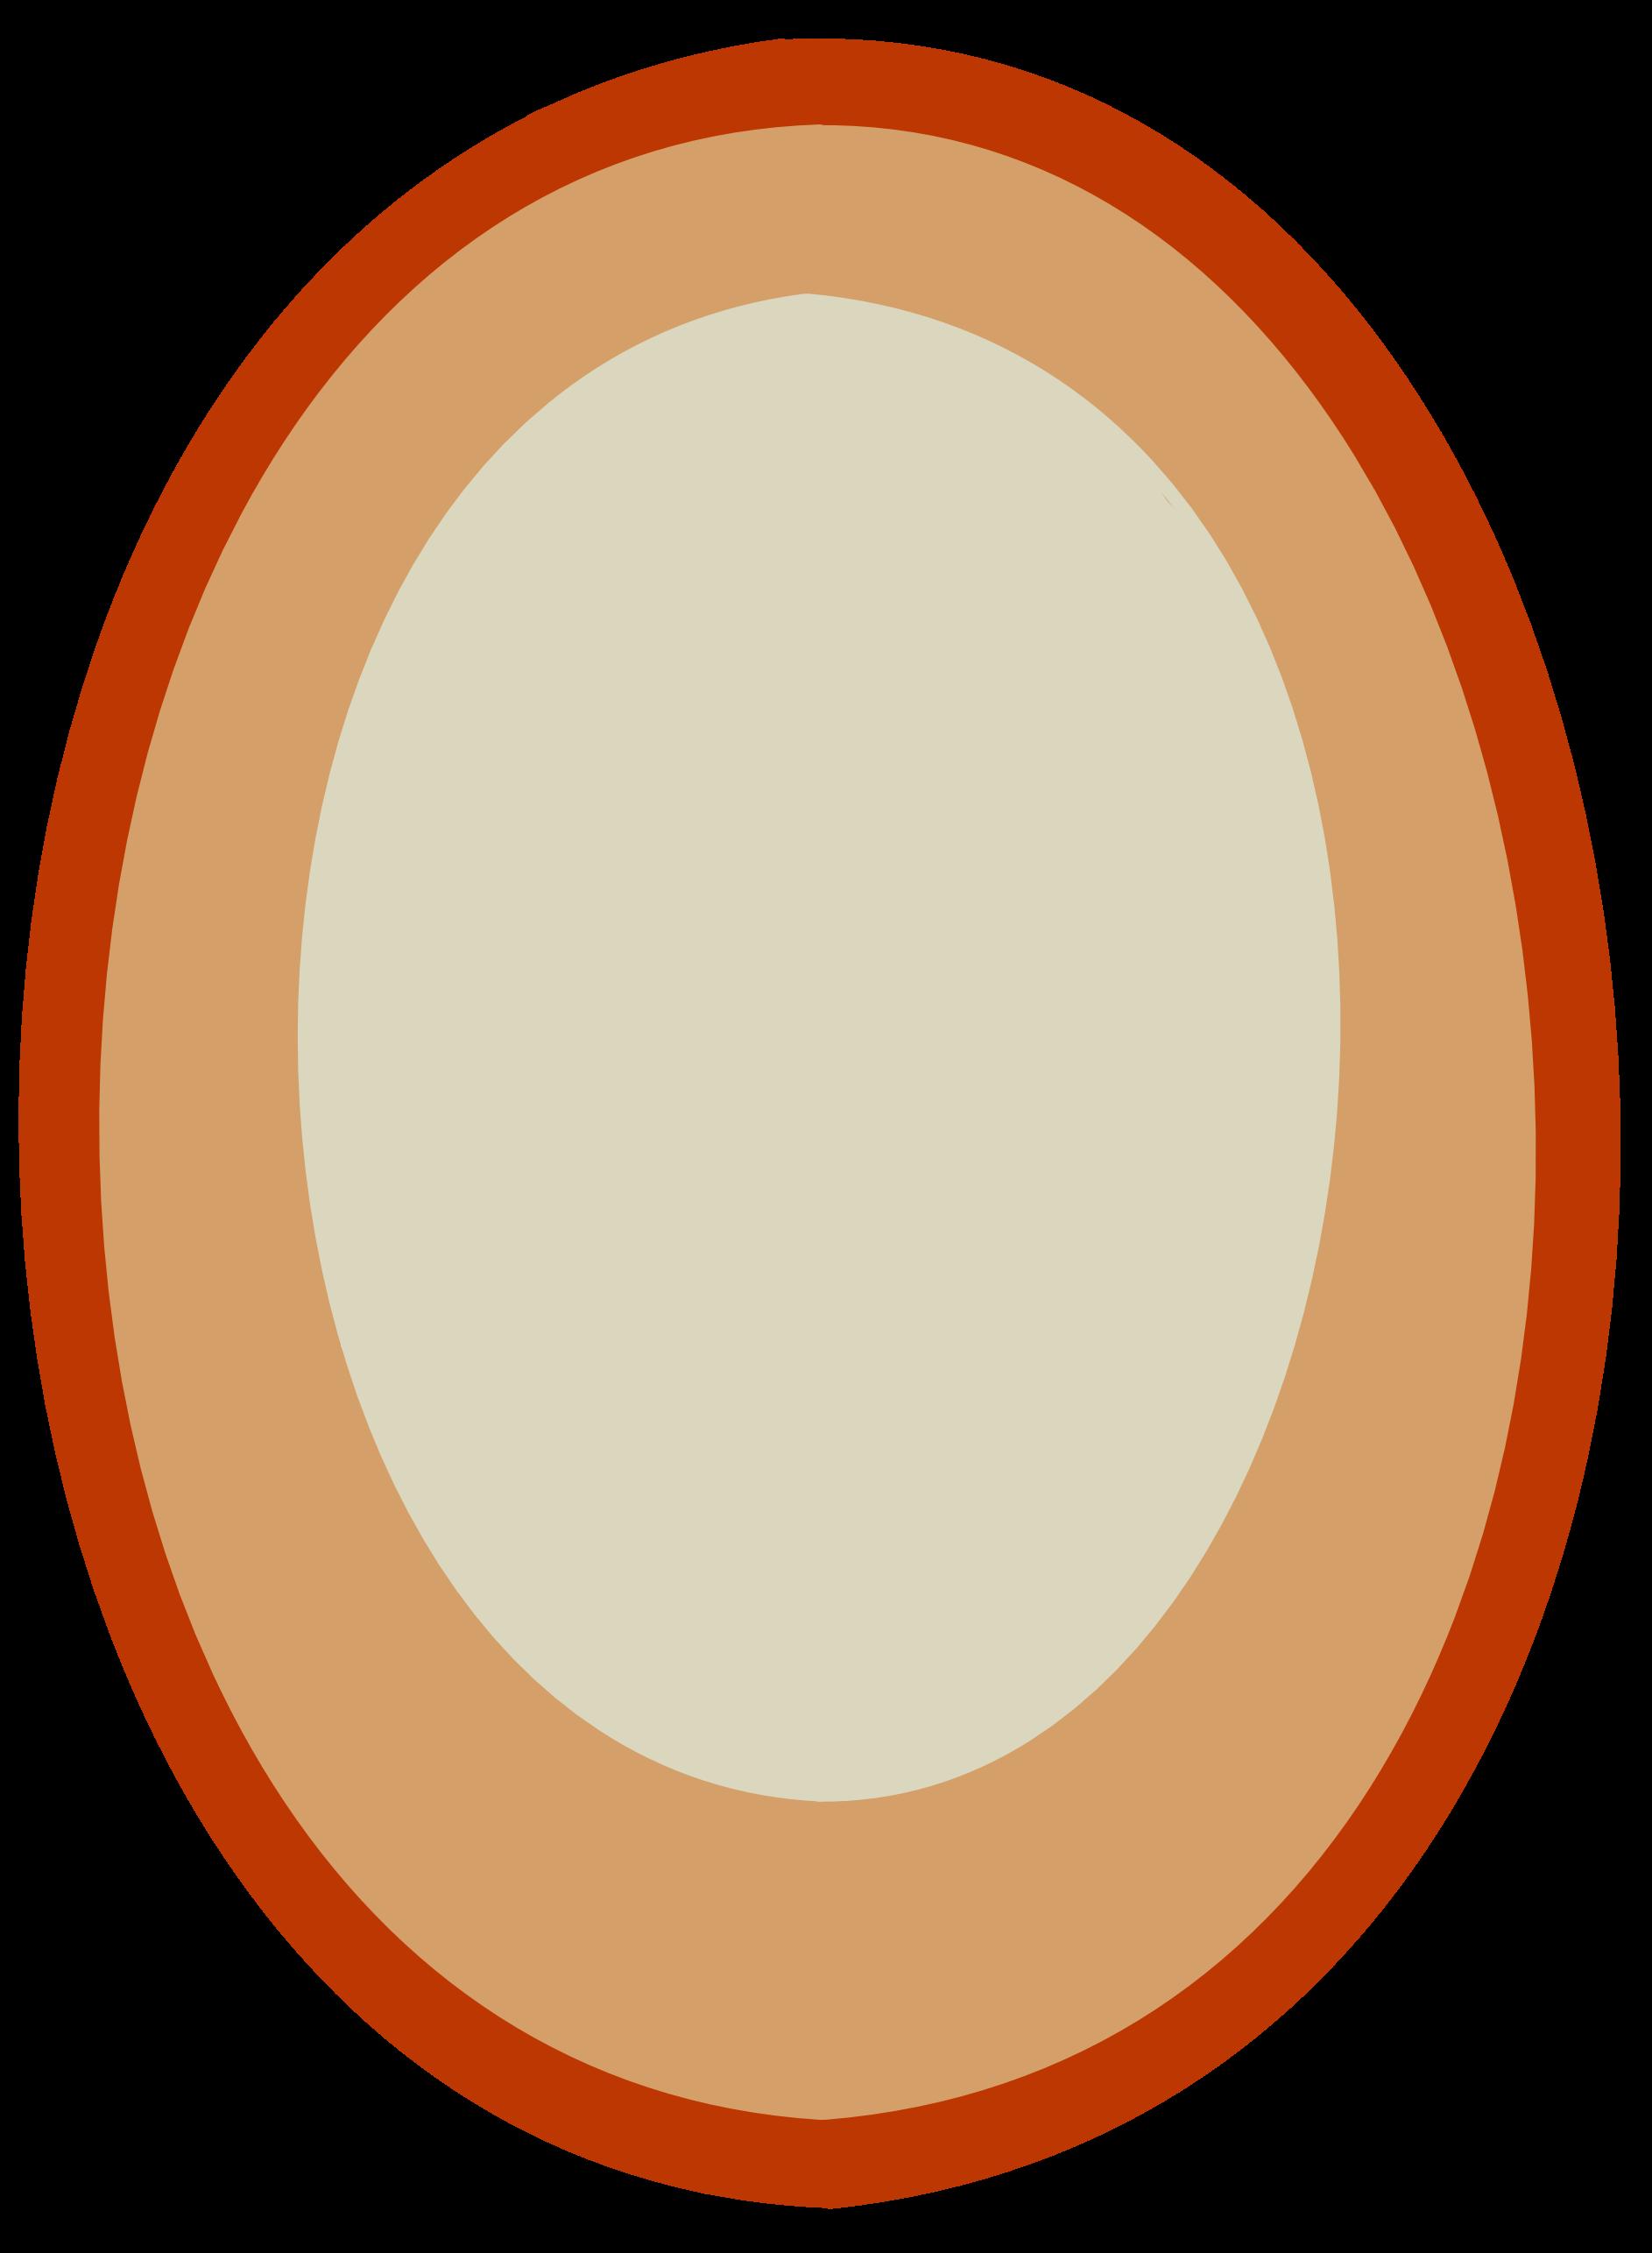 Image sardonyx pearl gemstone. Gem clipart oval